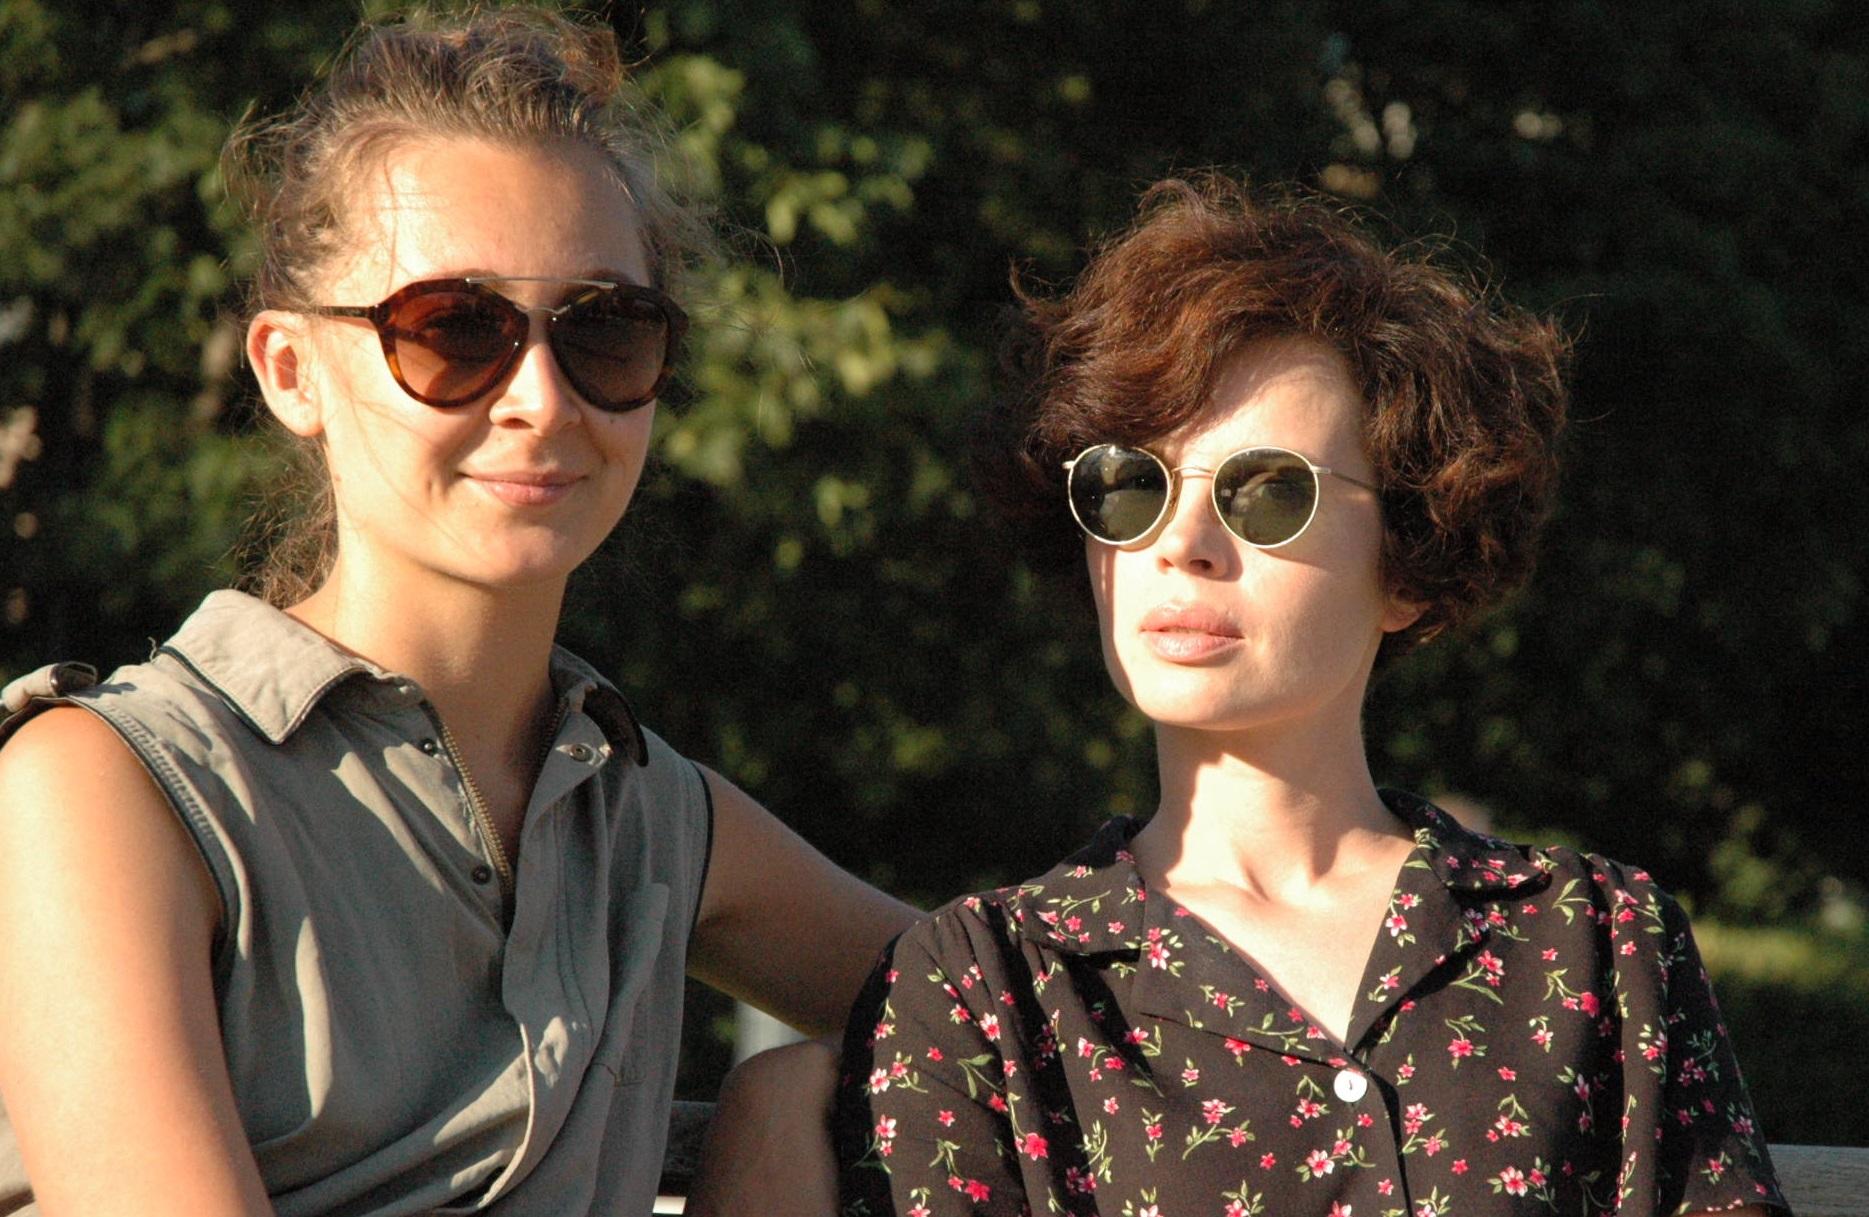 Moscow Food Stars. Alina Ermakova and Anna Bichevskaya